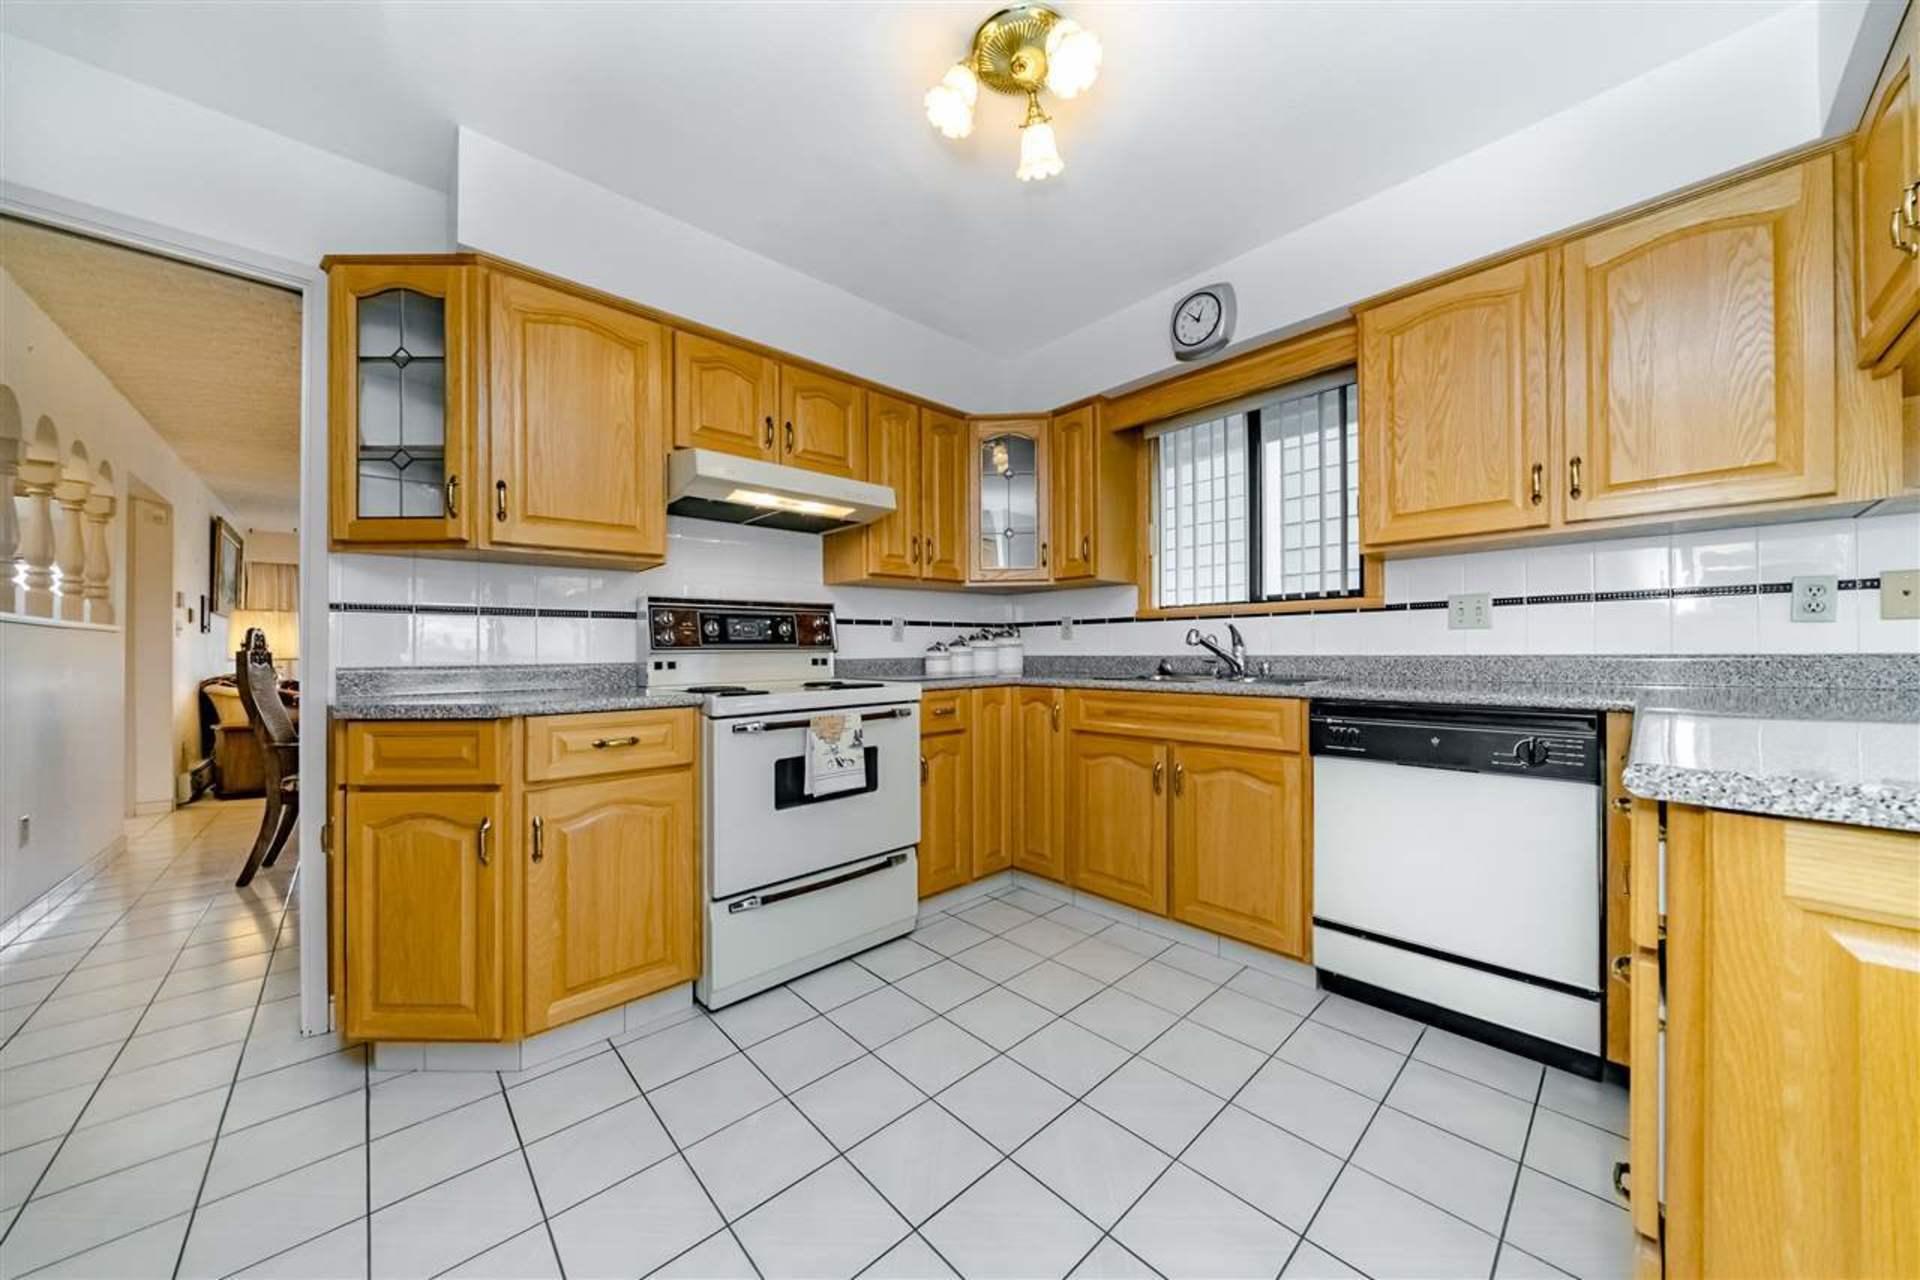 4730-union-street-willingdon-heights-burnaby-north-12 at 4730 Union Street, Willingdon Heights, Burnaby North